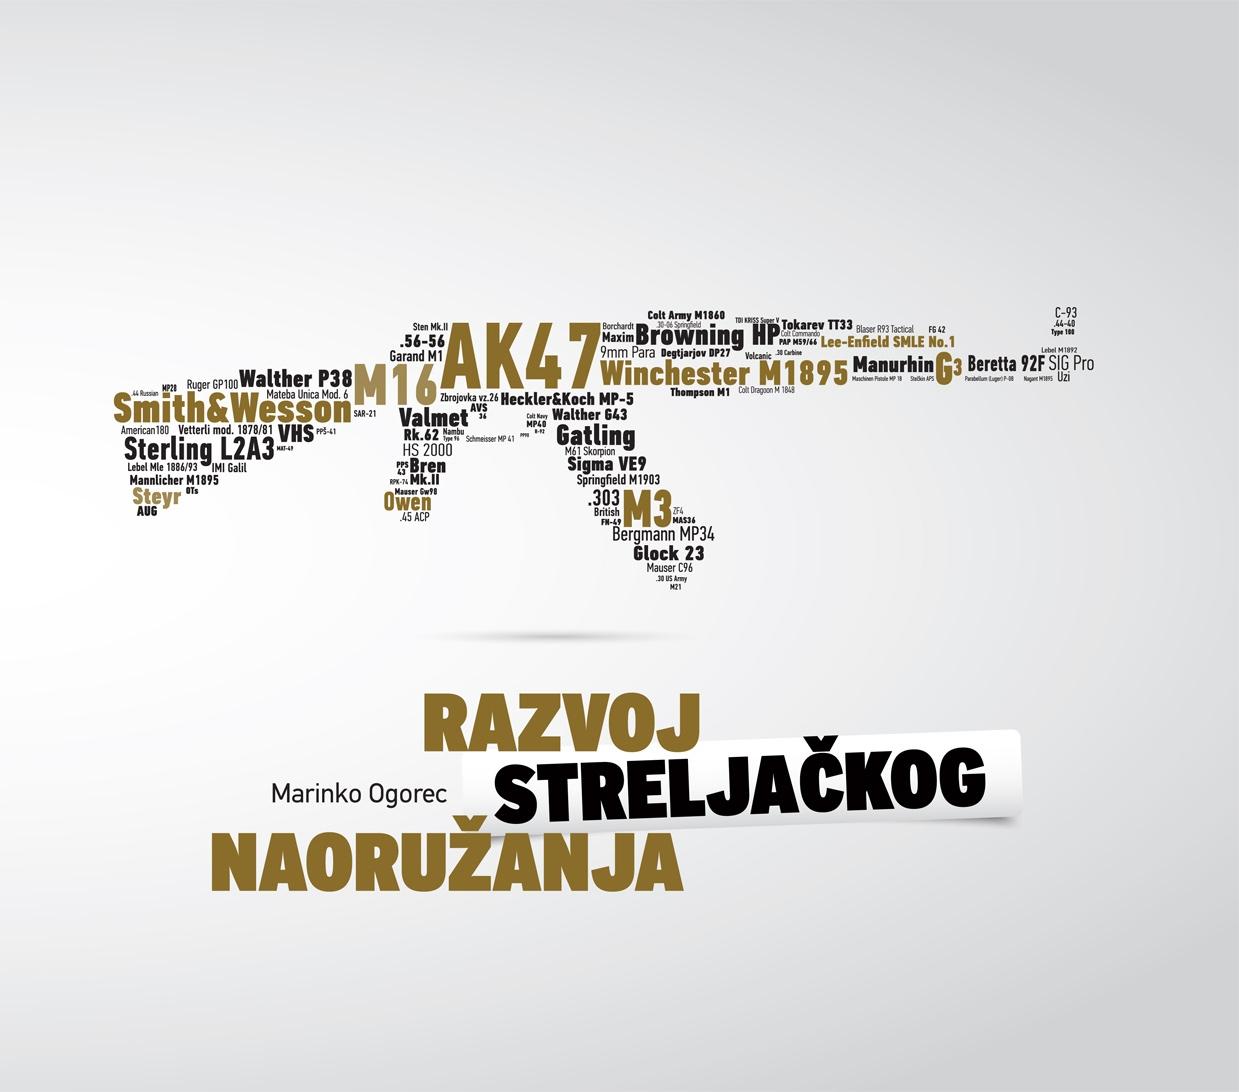 Razvoj streljačkog naoružanja